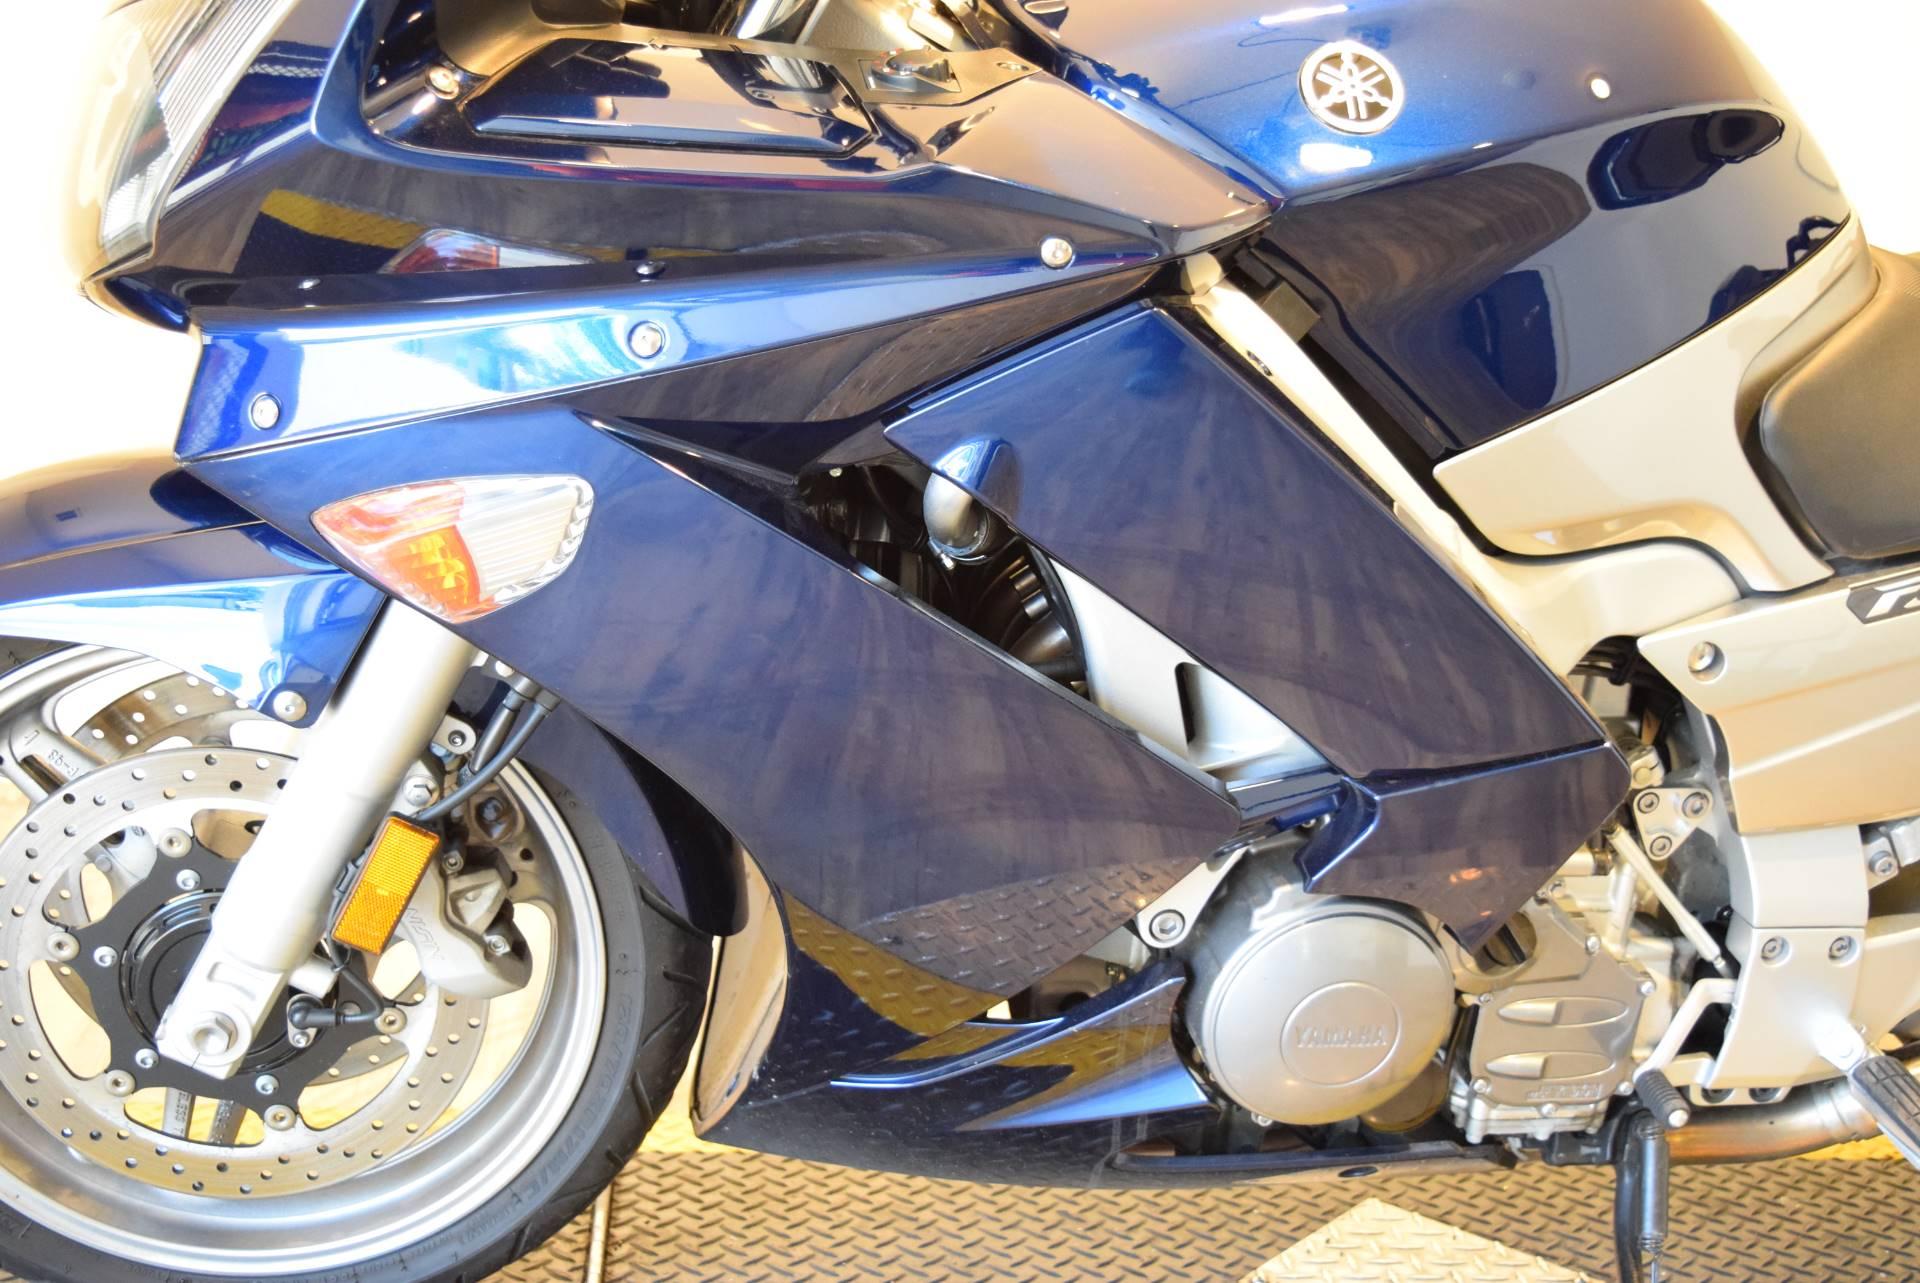 2012 Yamaha FJR1300A 12